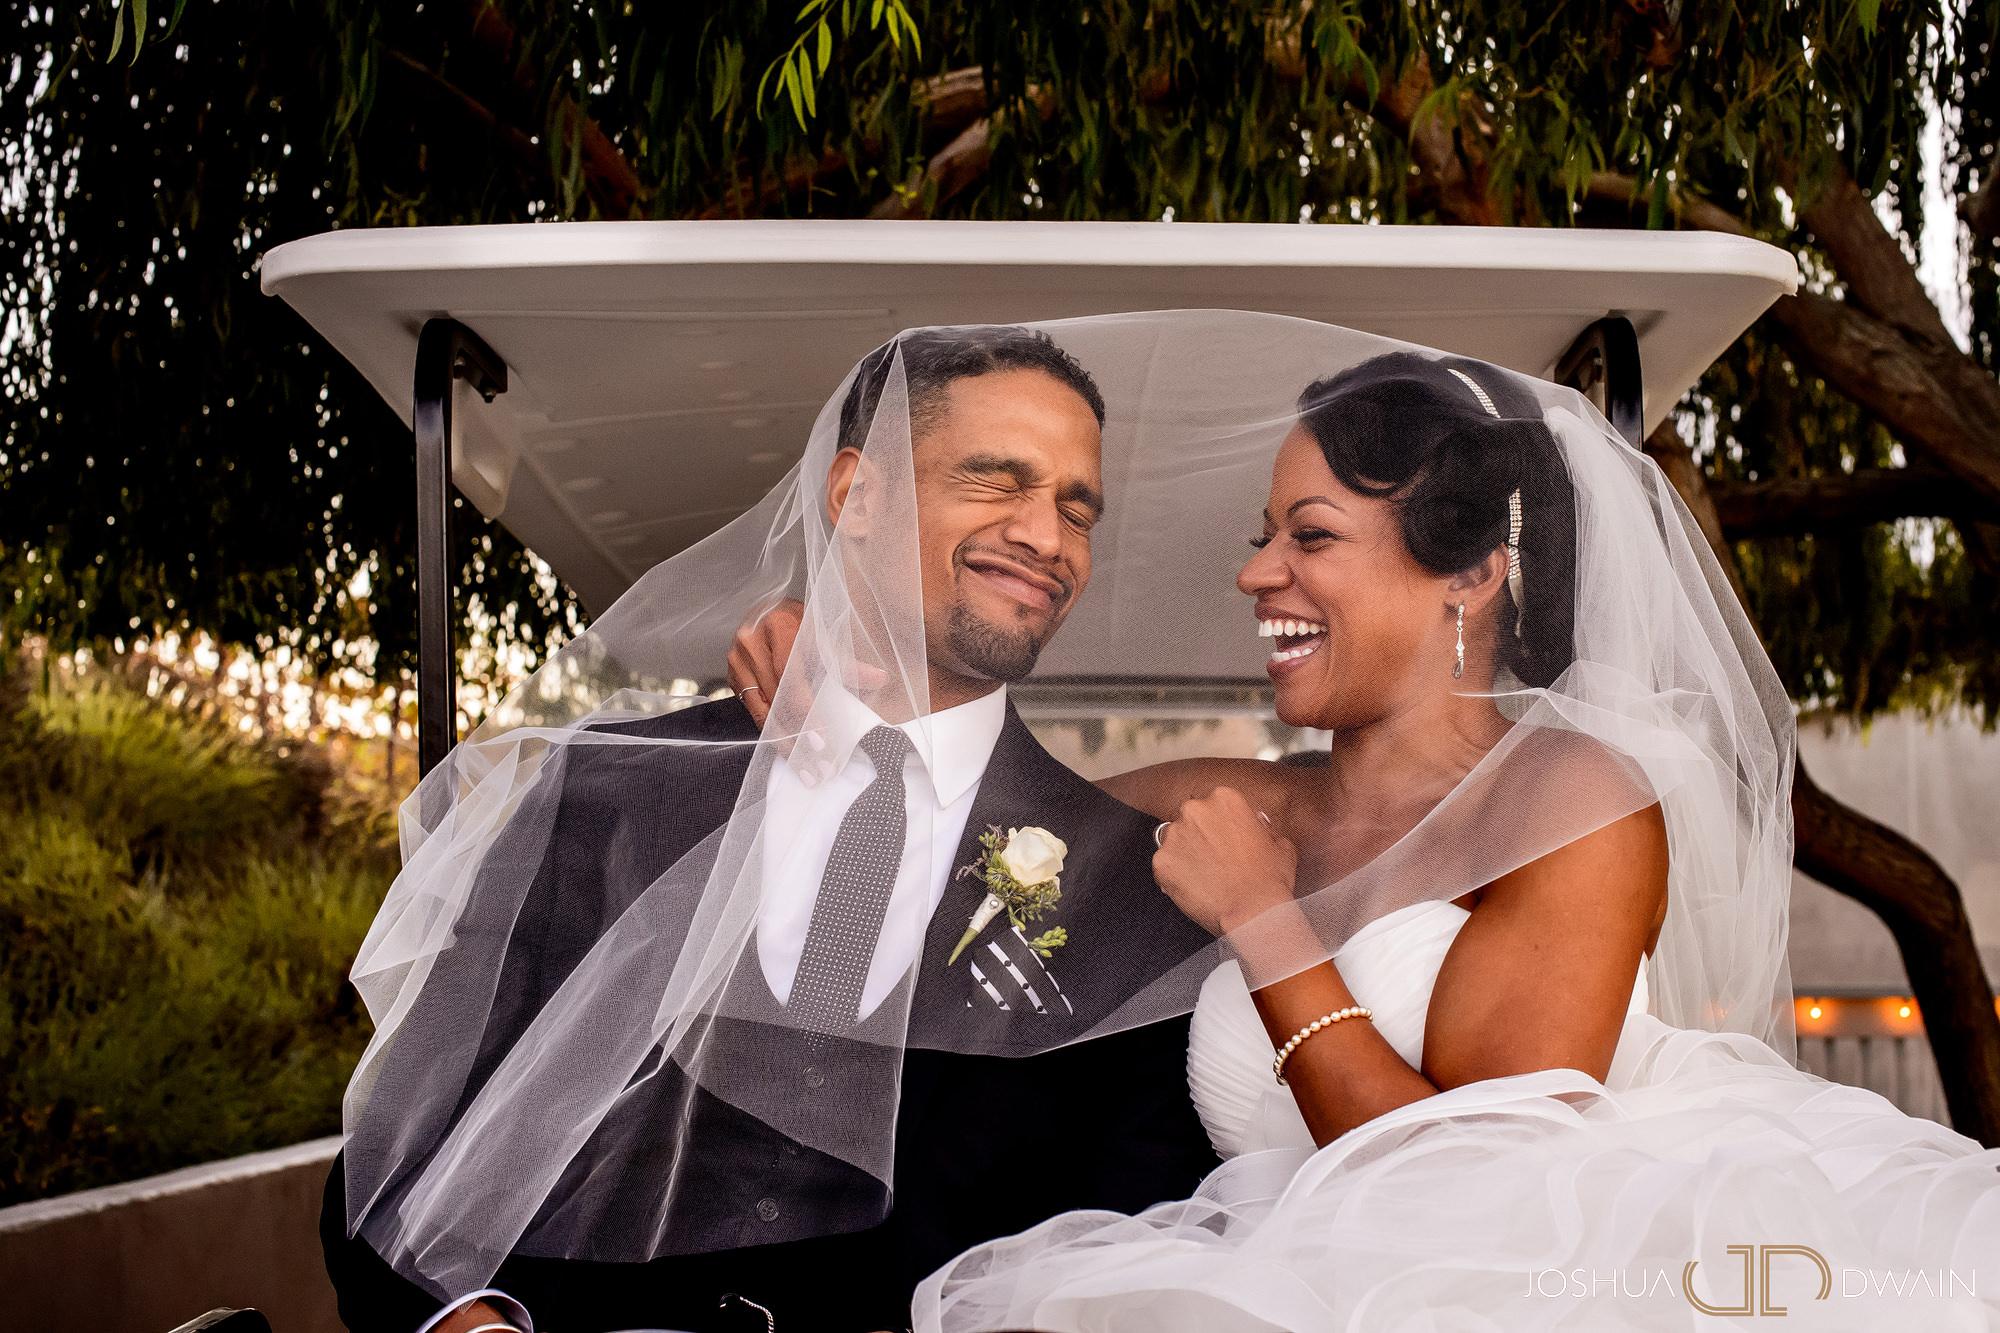 joshua-dwain-weddings-gallery-best-wedding-photographers-us-038